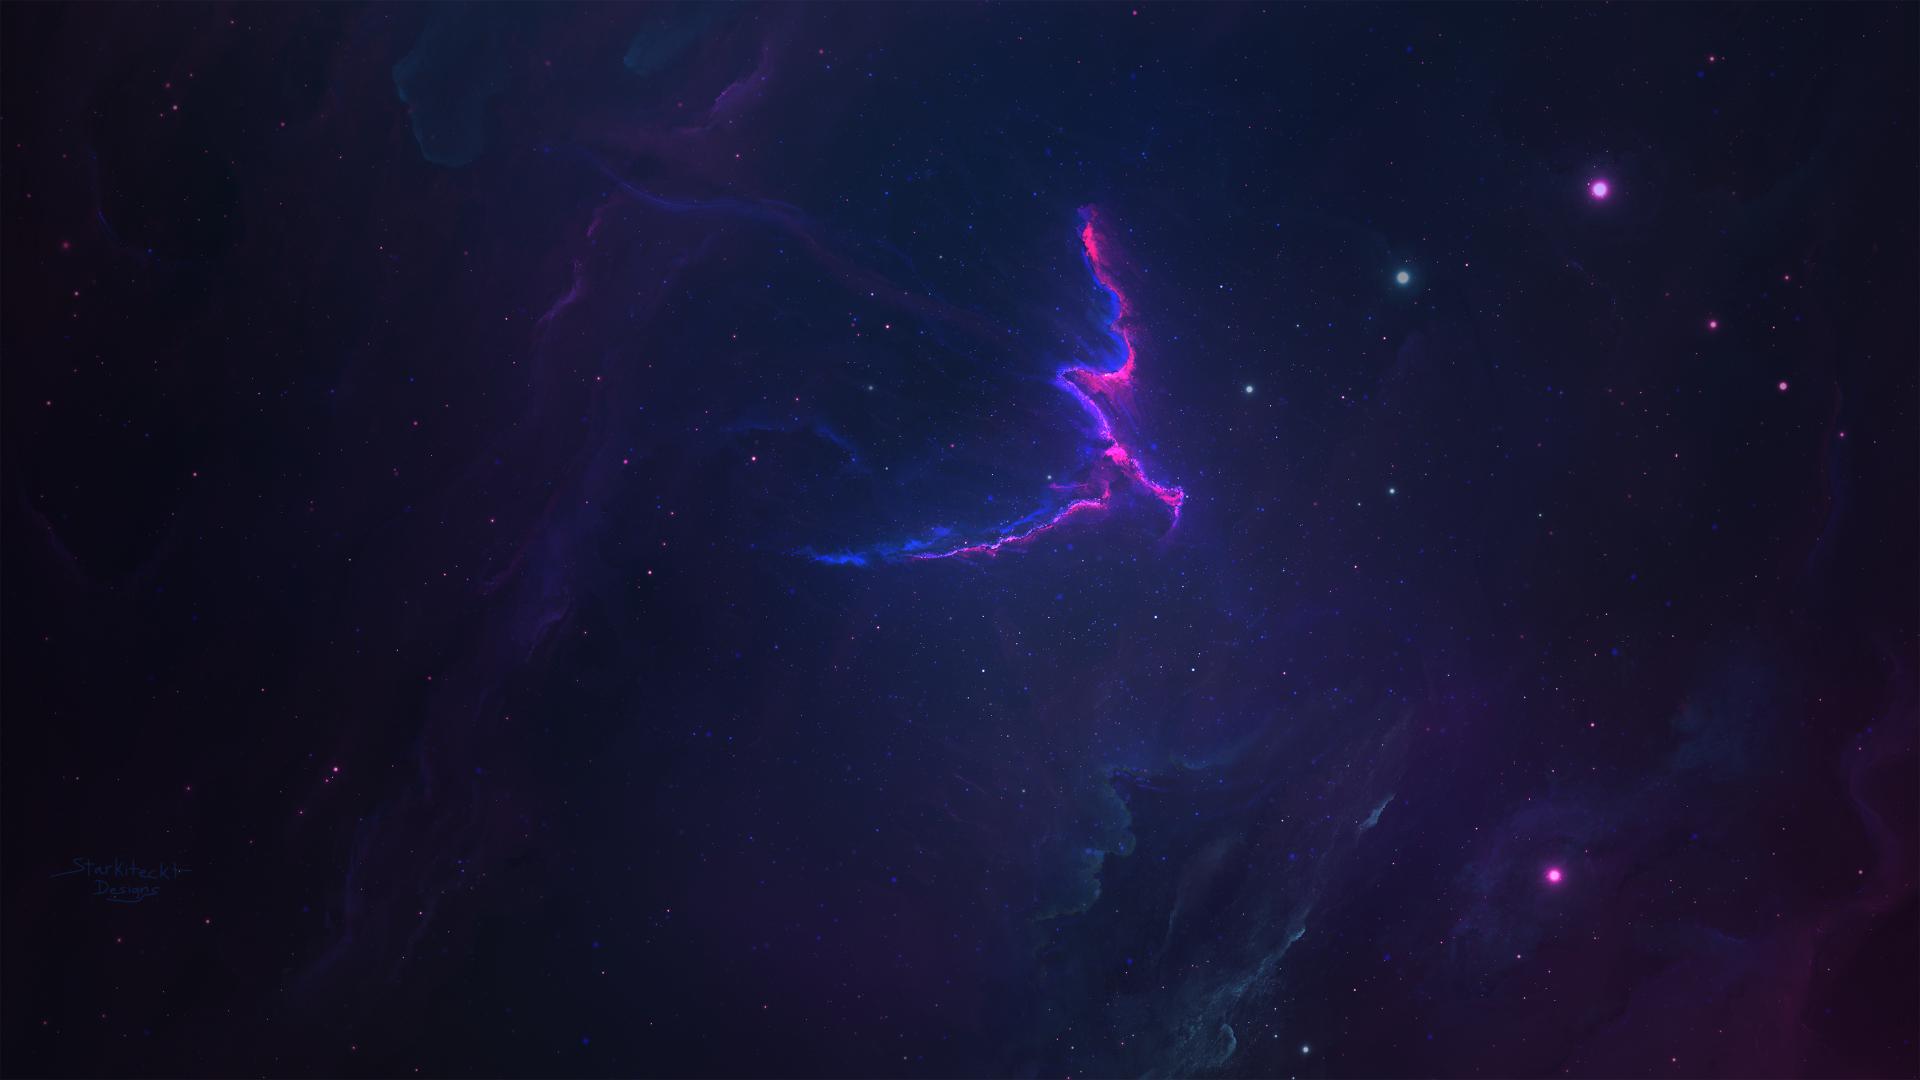 Sci Fi - Nebula  Space Cosmos Abstract Blue Purple Dark Wallpaper